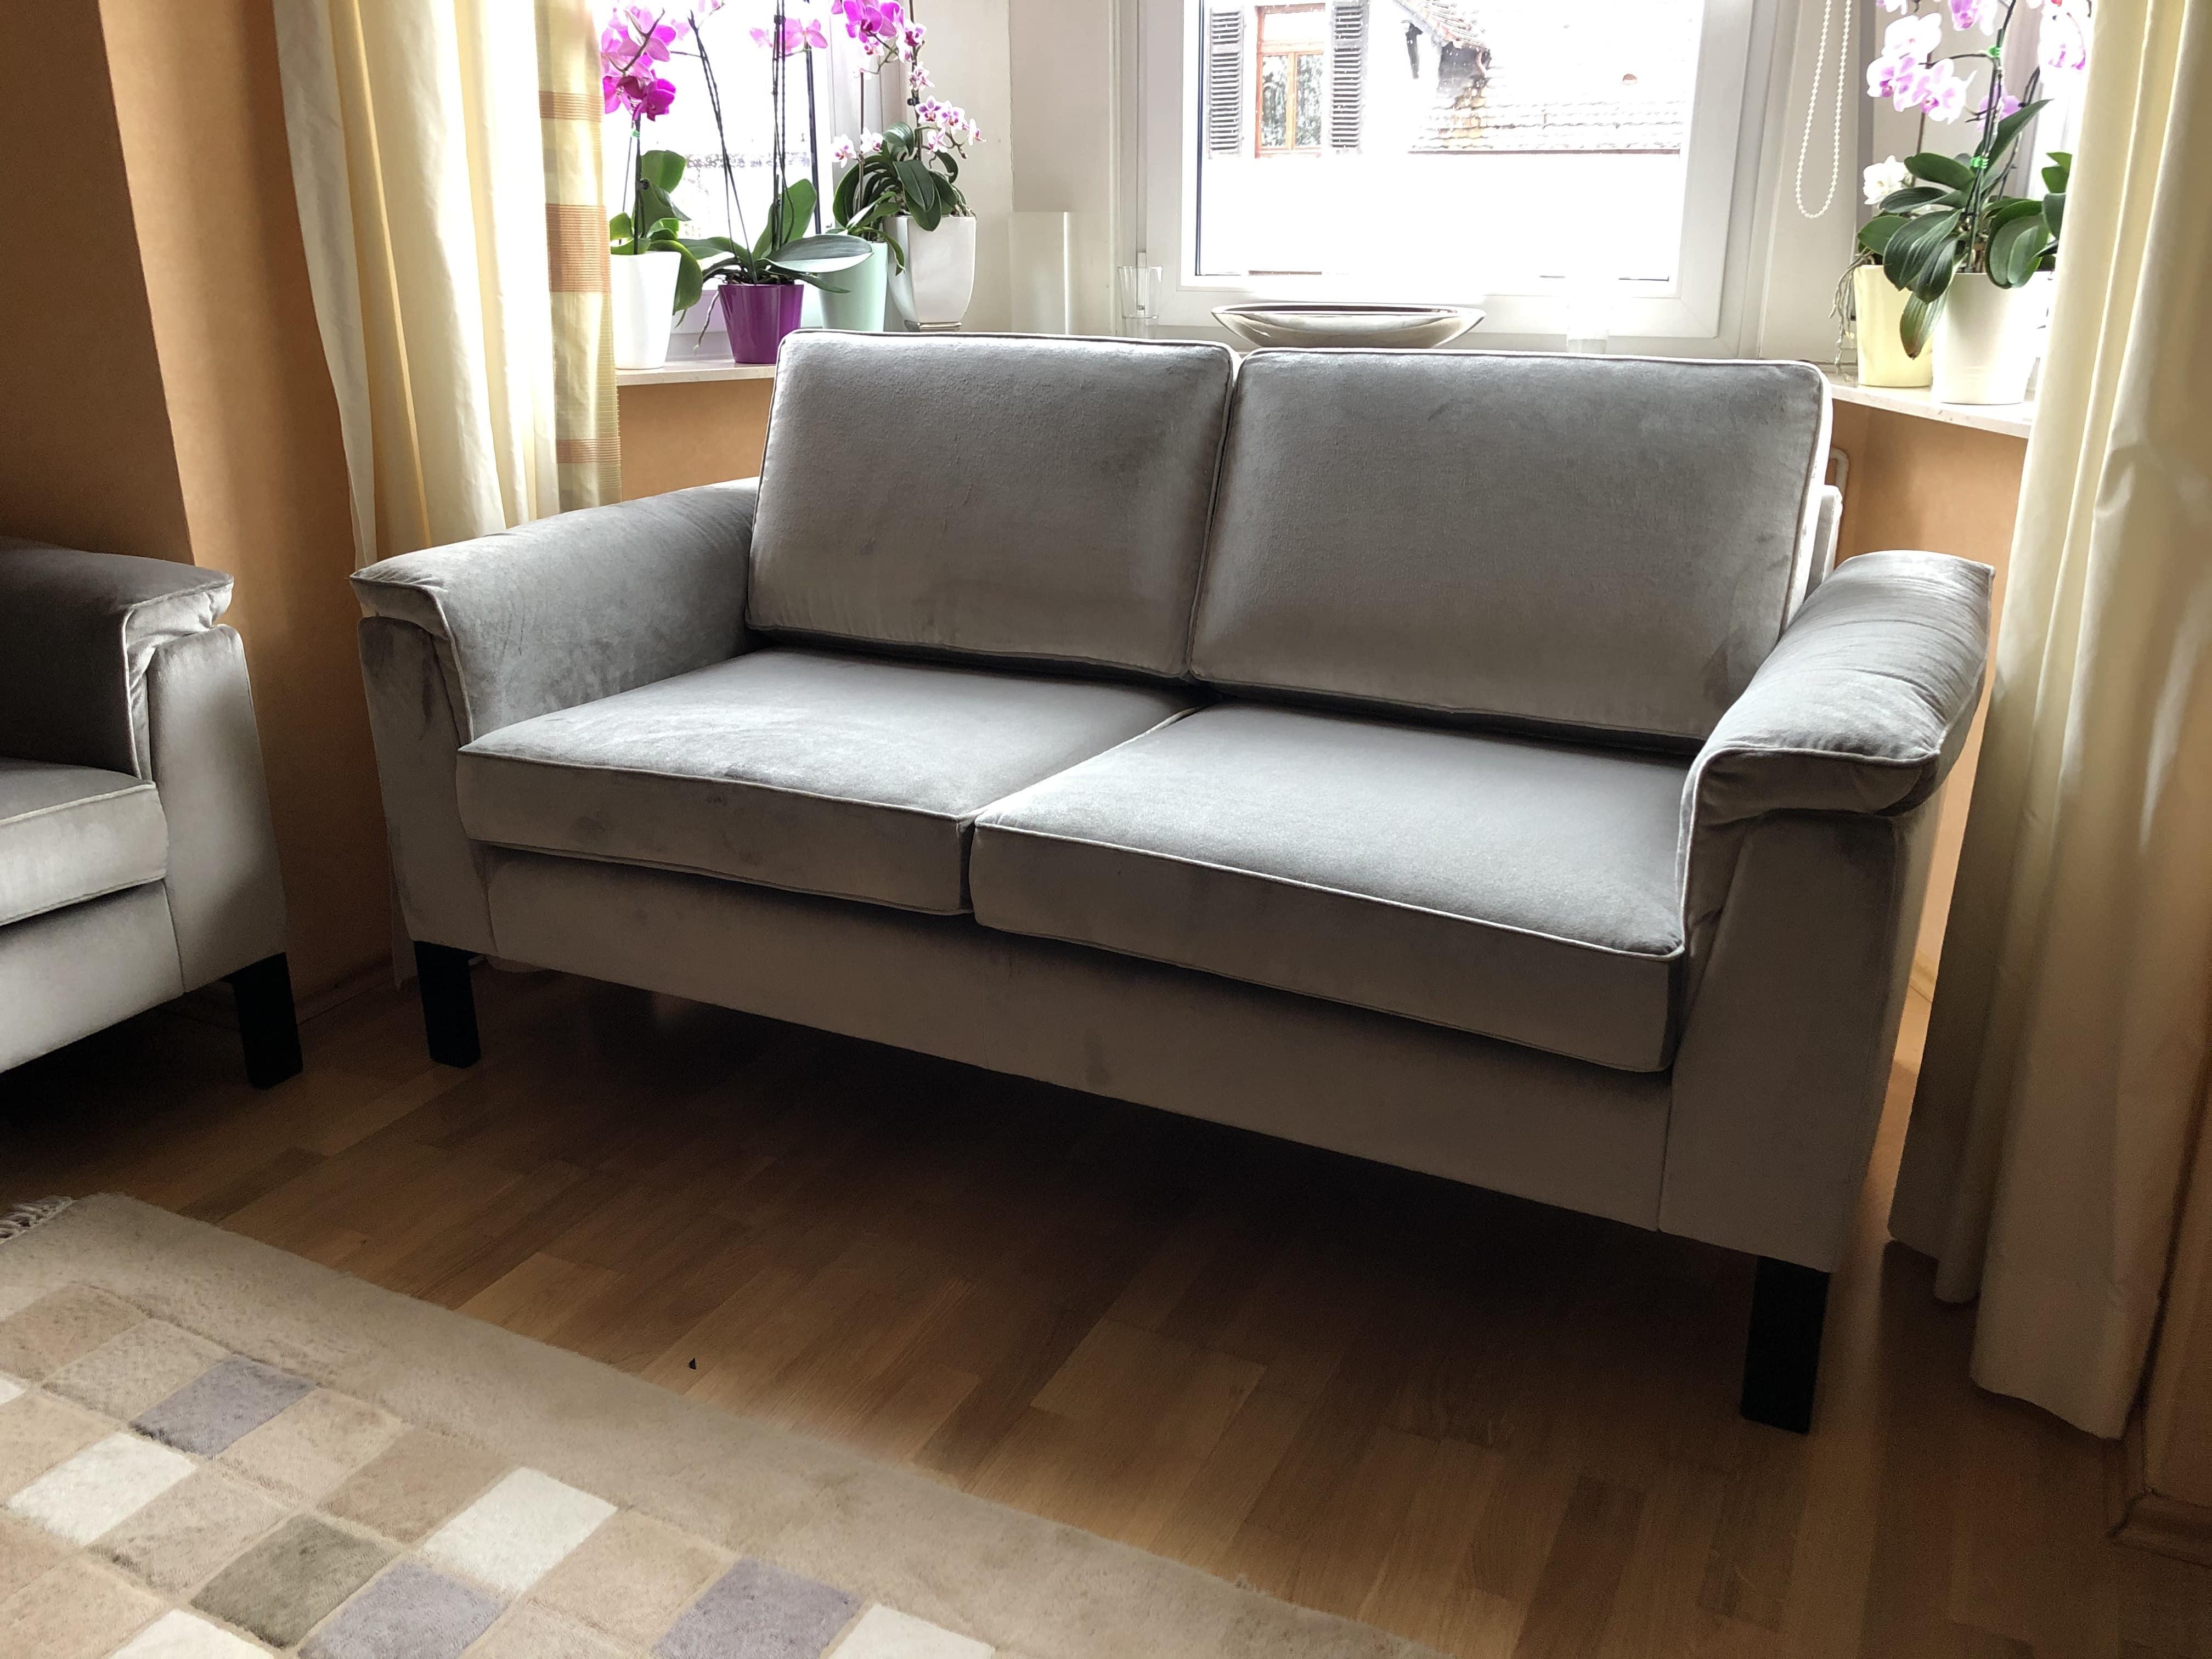 Sofa 2 Timeless Modern